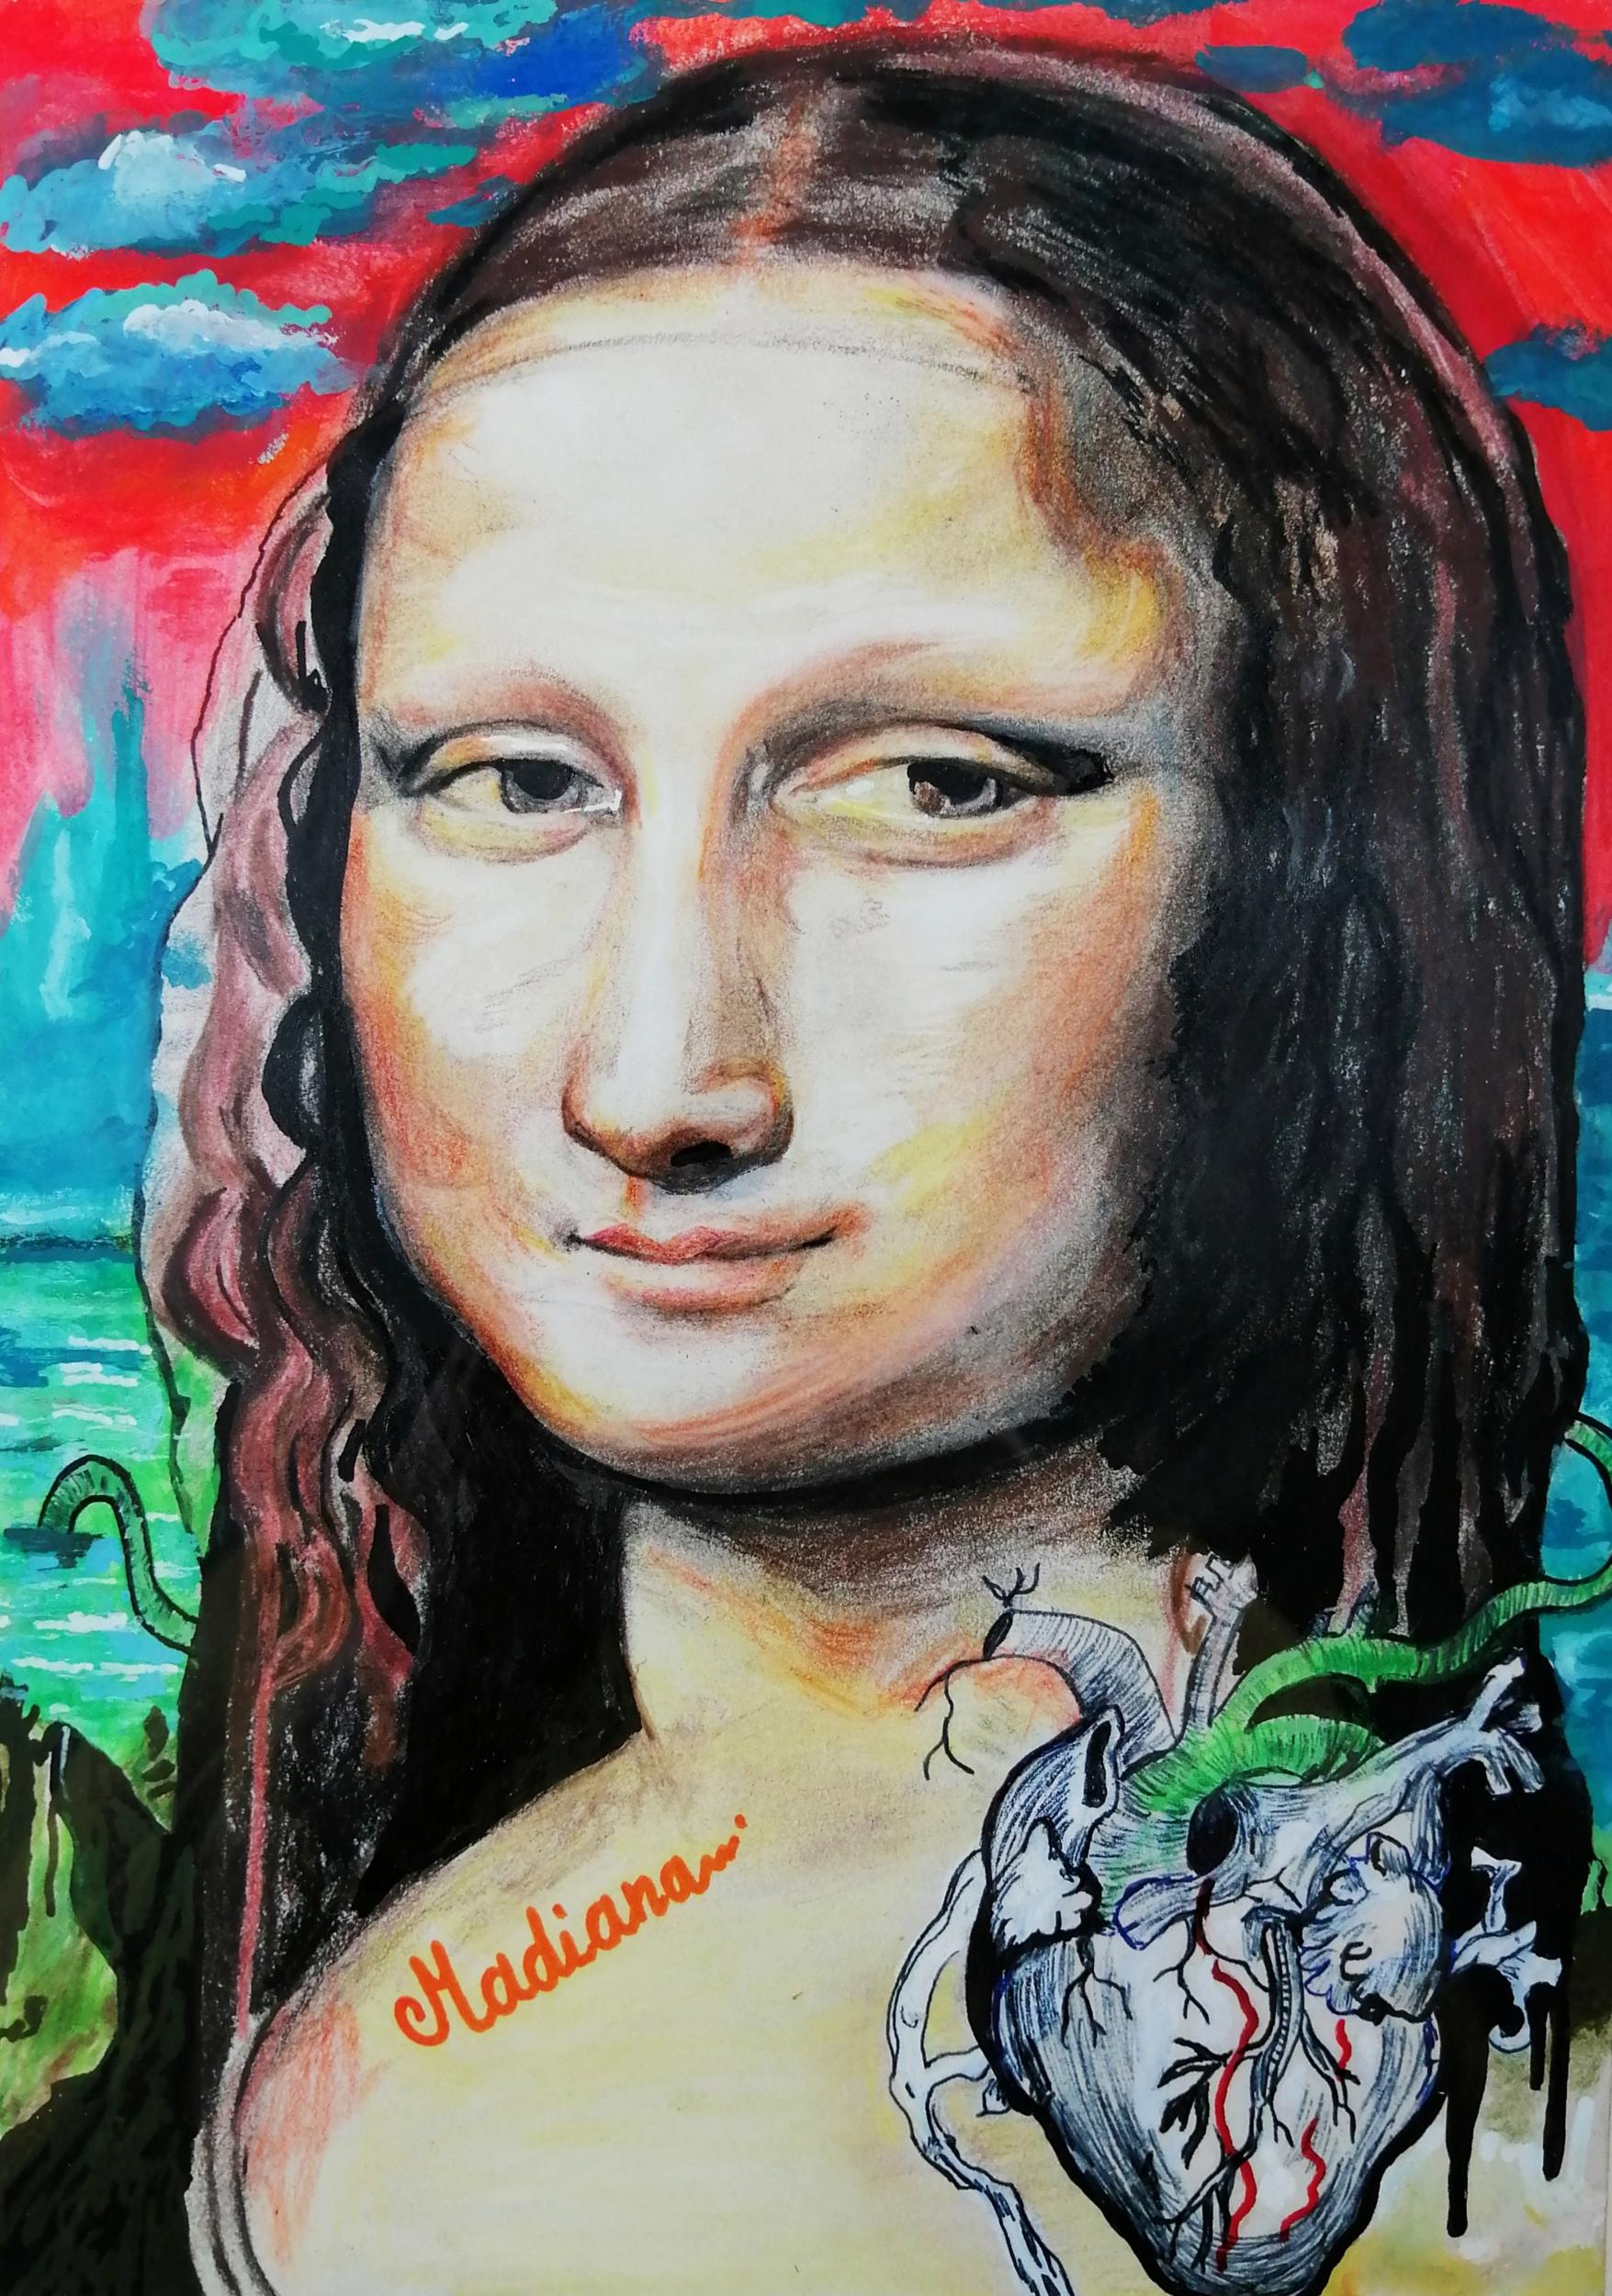 affiche poster art la joconde contemporain art artiste